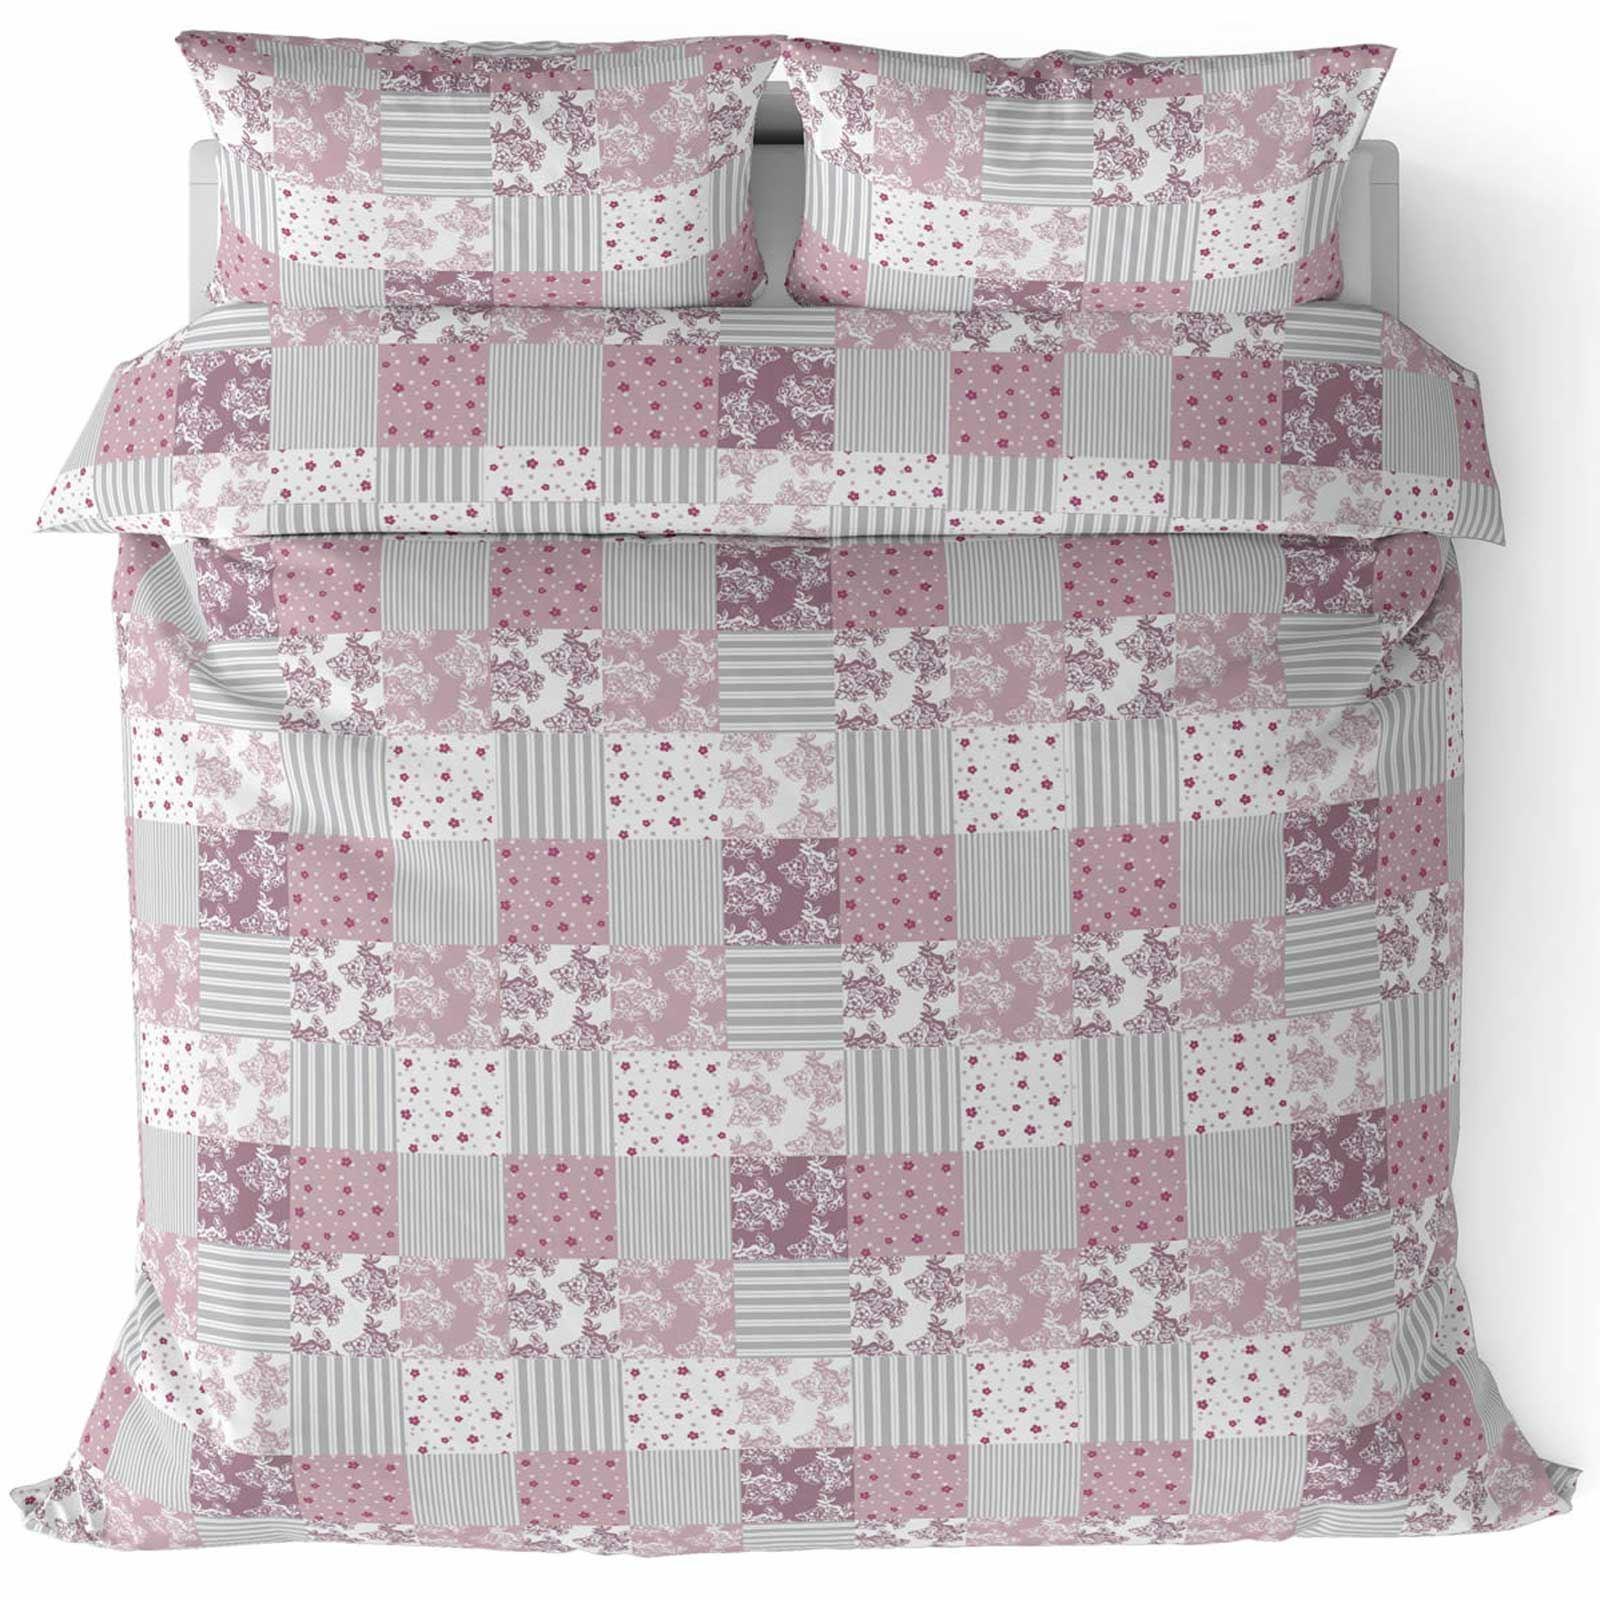 Cubierta-Edredon-Rosa-Blush-Rose-Impreso-juego-De-Edredon-Conjuntos-de-Cama-cubre-Jacquard miniatura 13